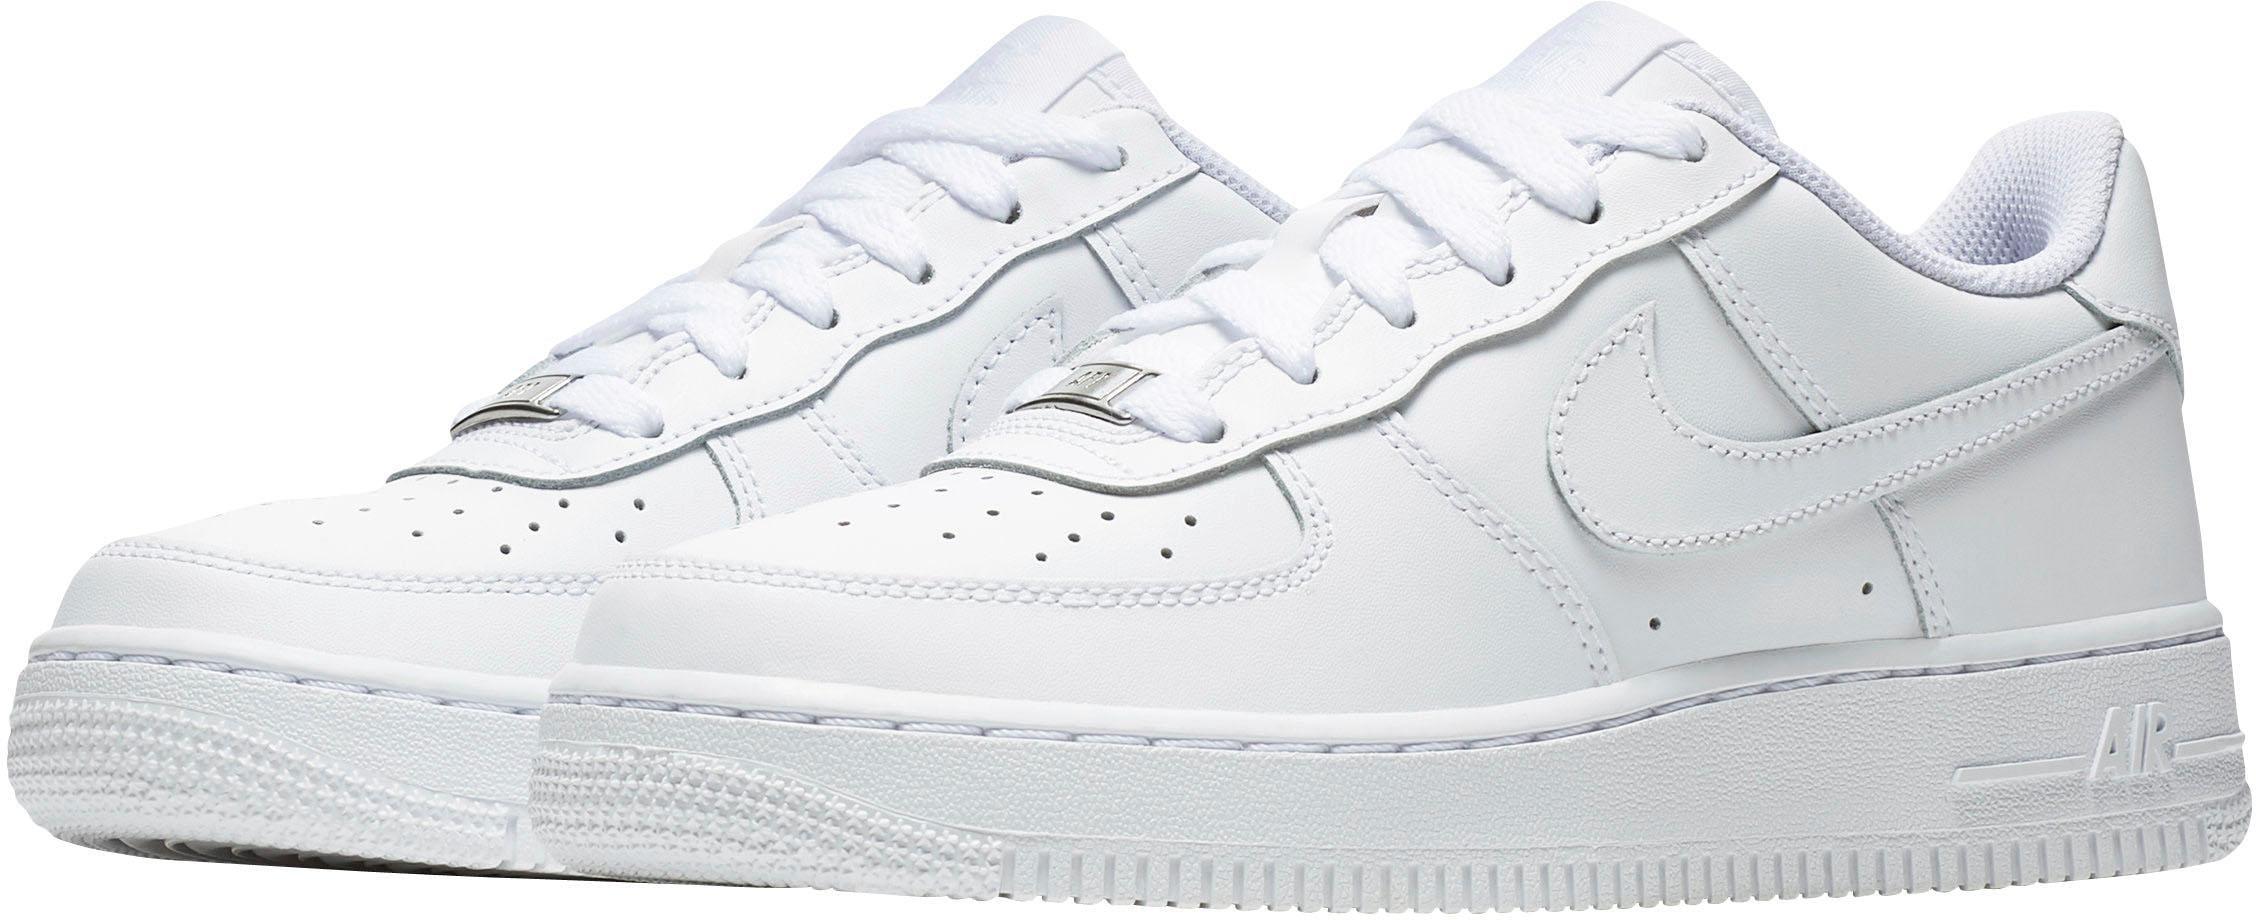 Nike Sportswear Sneaker »AIR FORCE 1 BG« online bestellen | BAUR